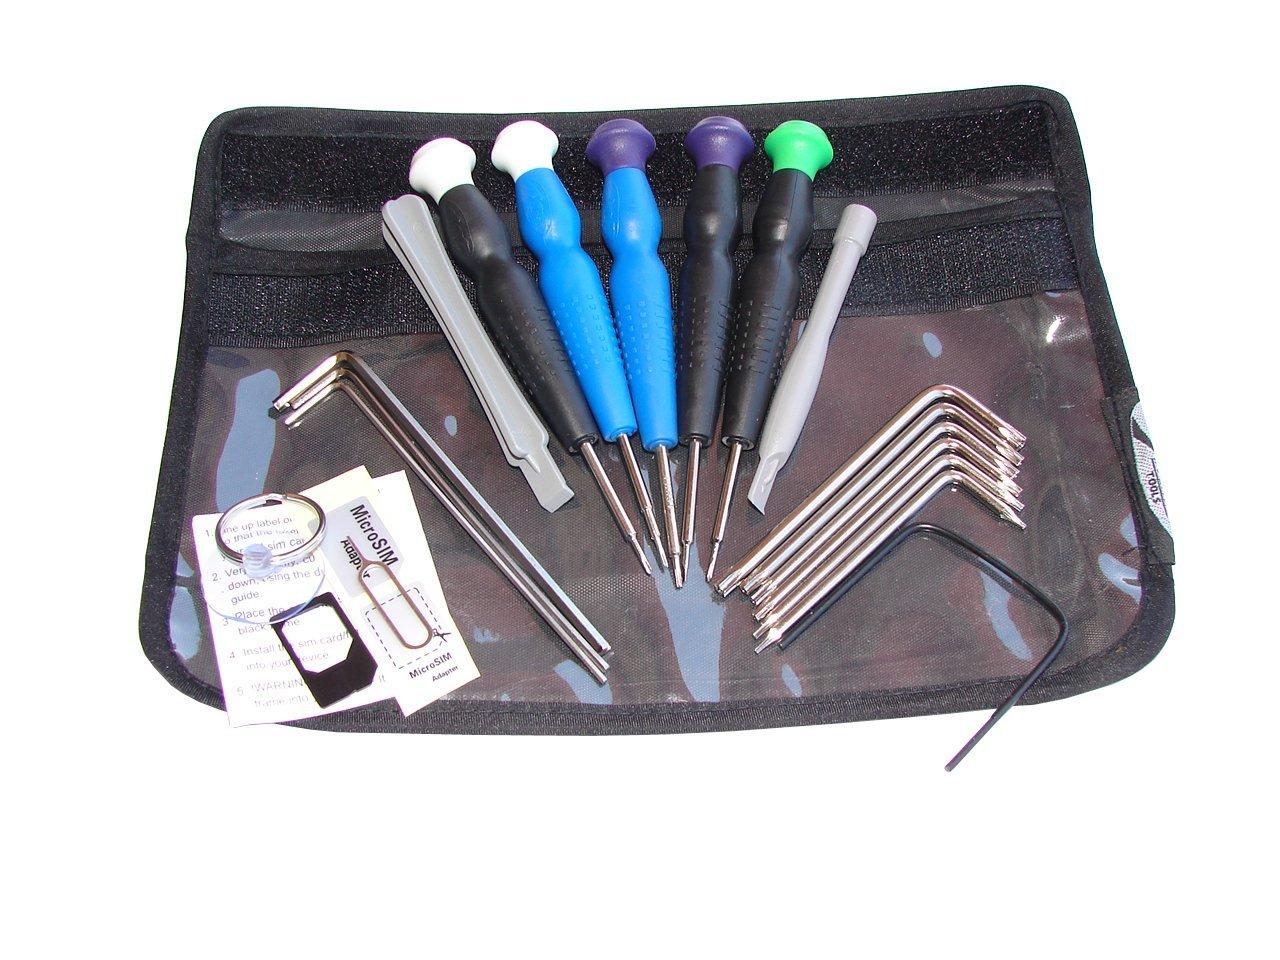 Silverhill Tools